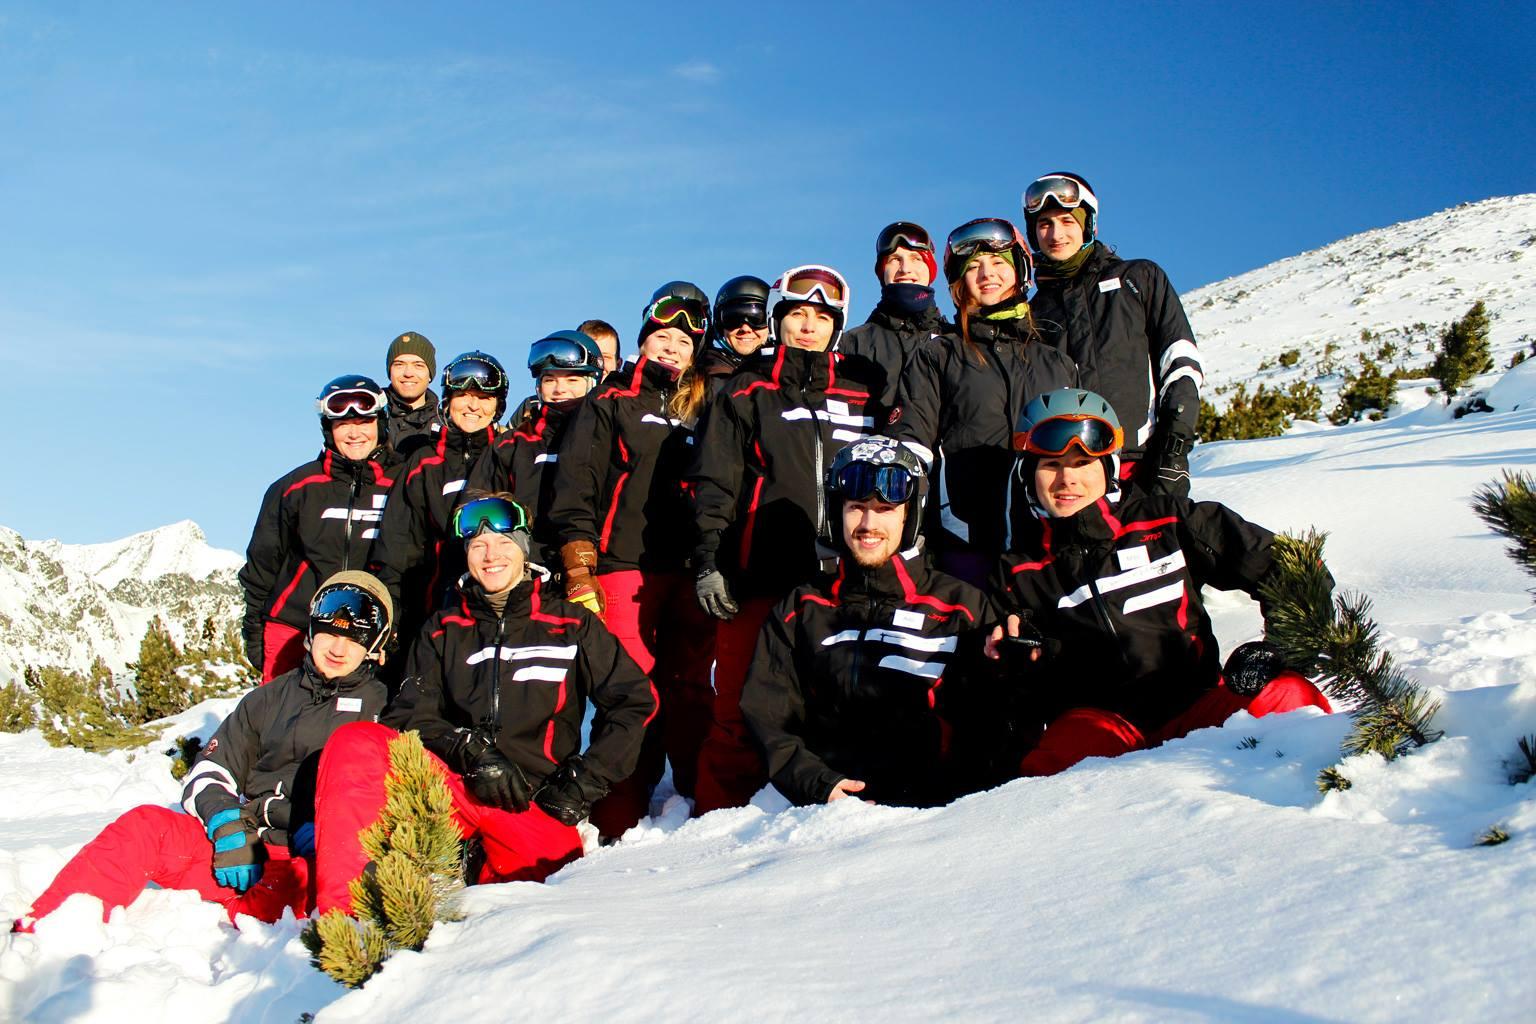 Ski school; alpine; crosscountry; skiing; snowboarding; Štrbské Pleso; High Tatras